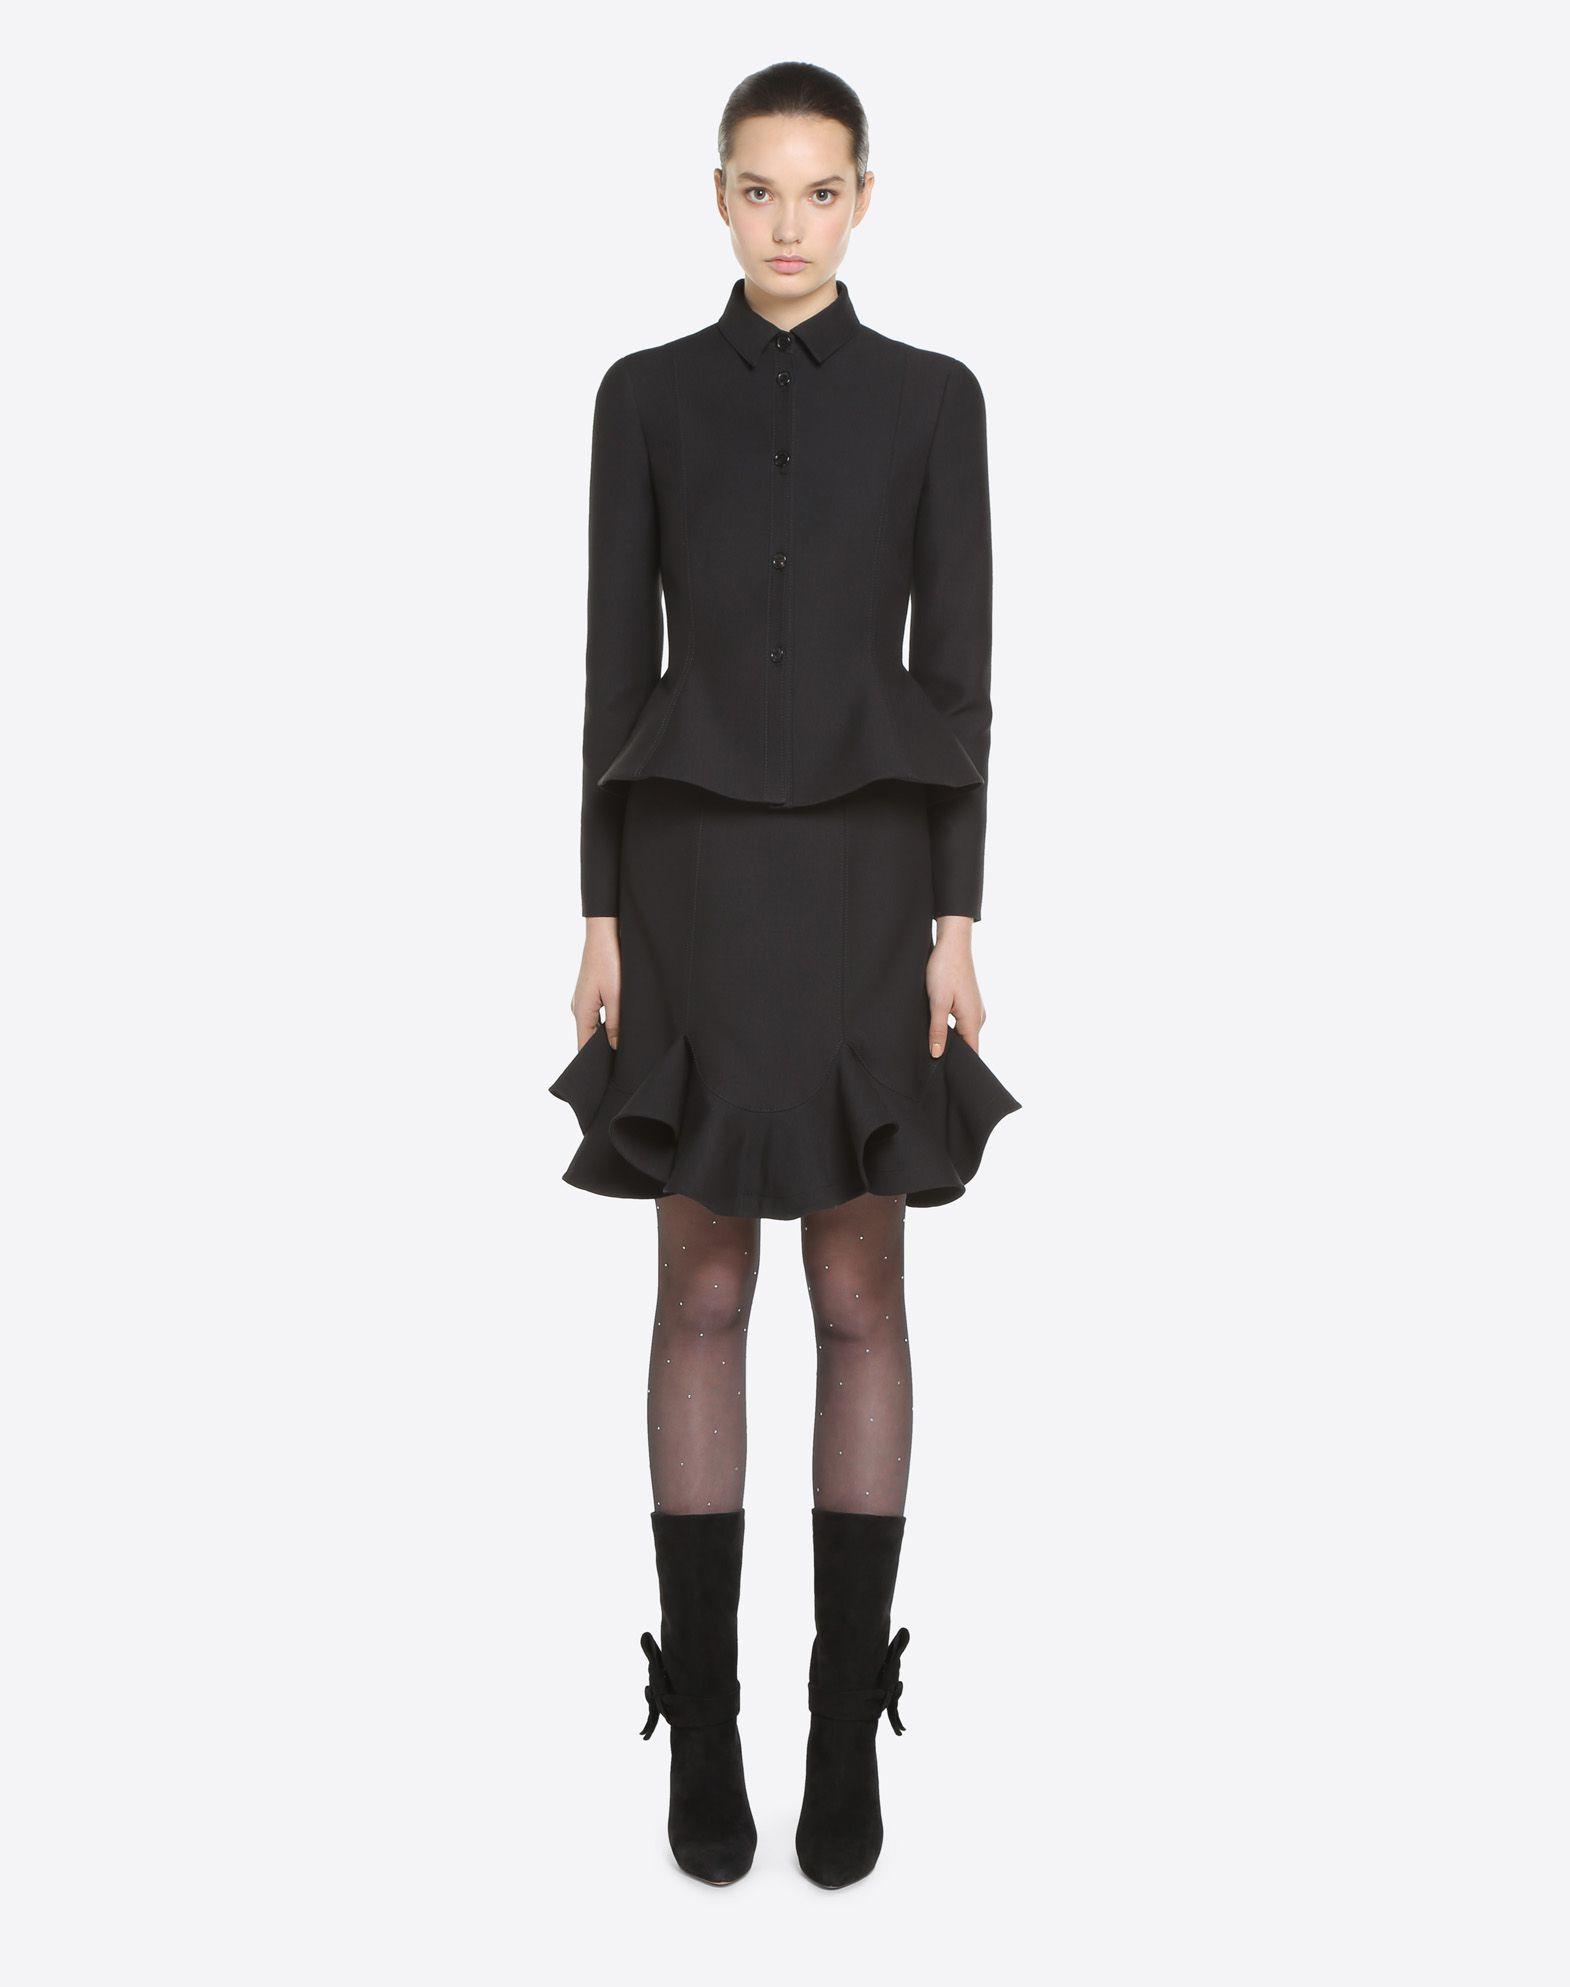 VALENTINO Couture 绉绸夹克 夹克 D r